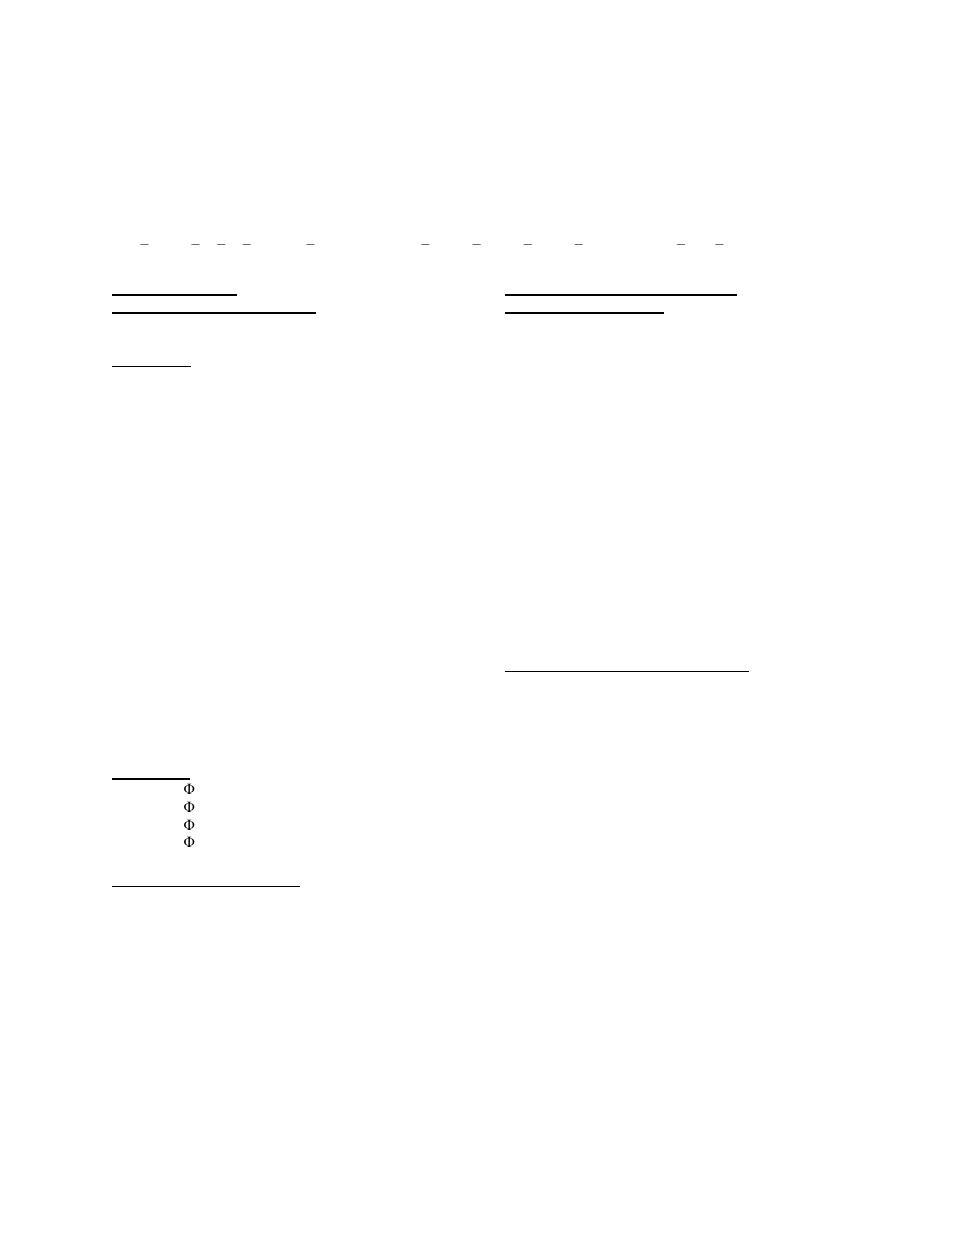 Rl series feature string nomenclature, Base model, Model